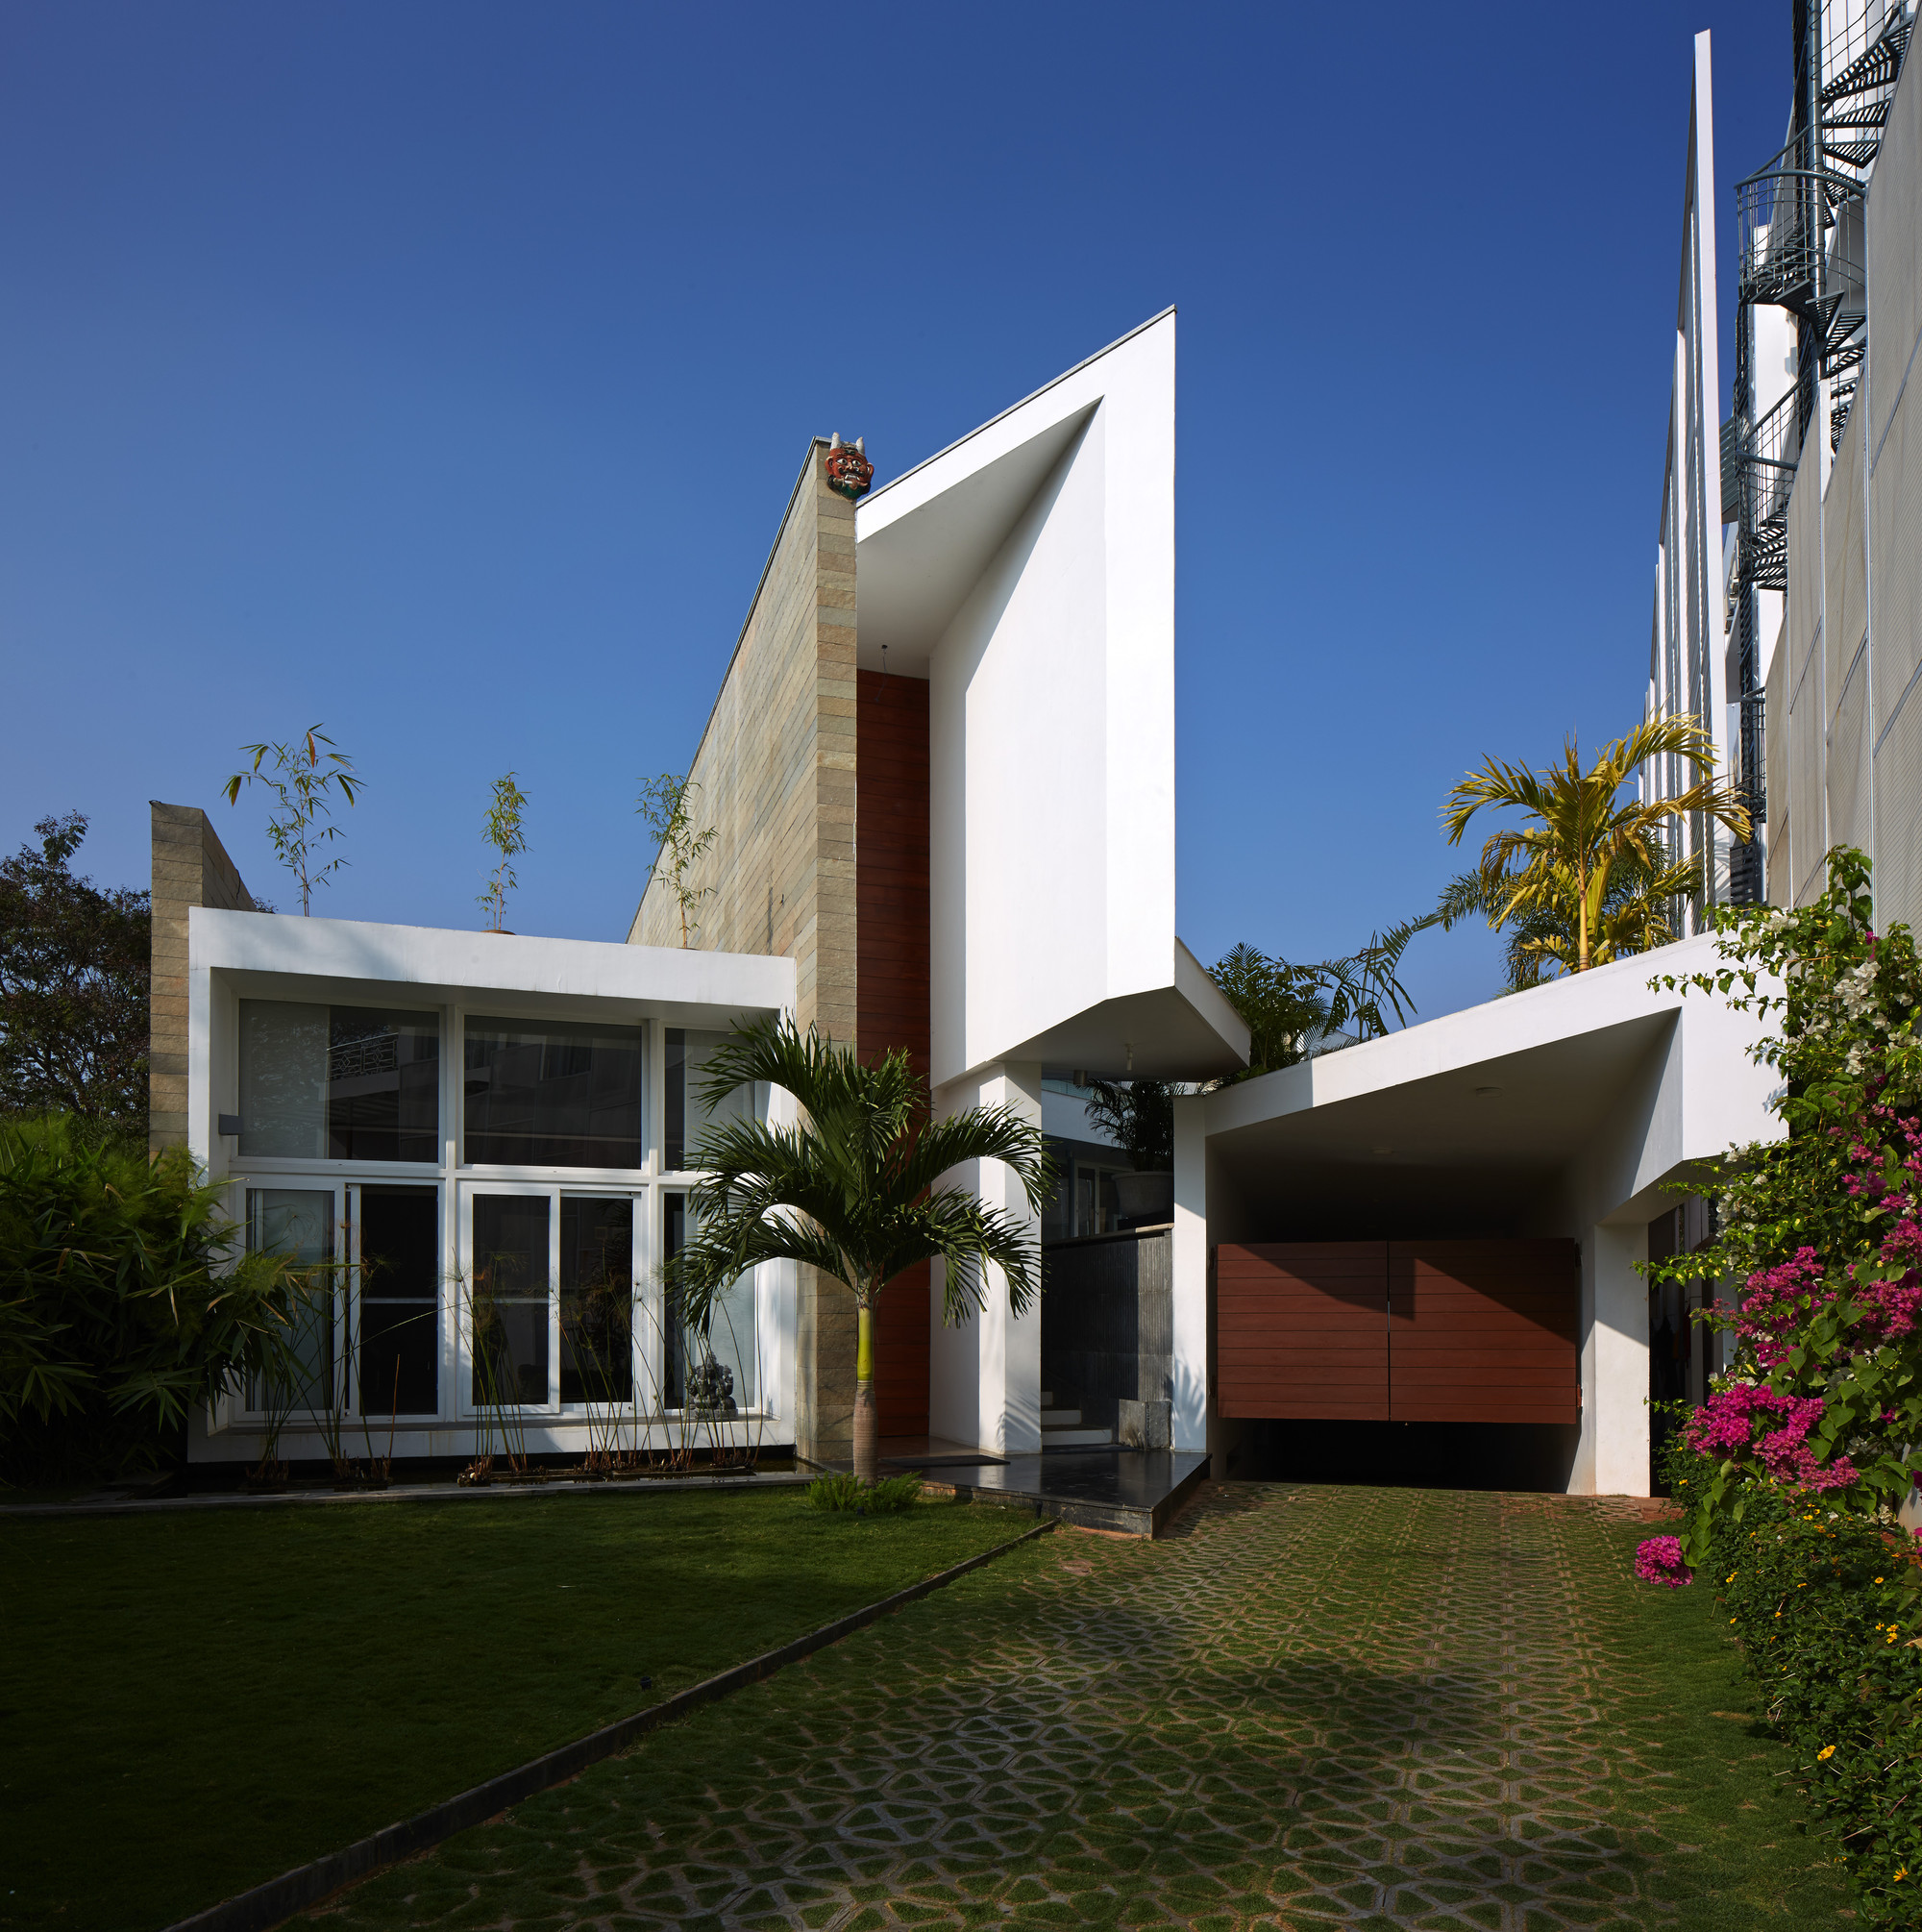 Casa Fort / Sameep Padora & Associates, © Edmund Sumner